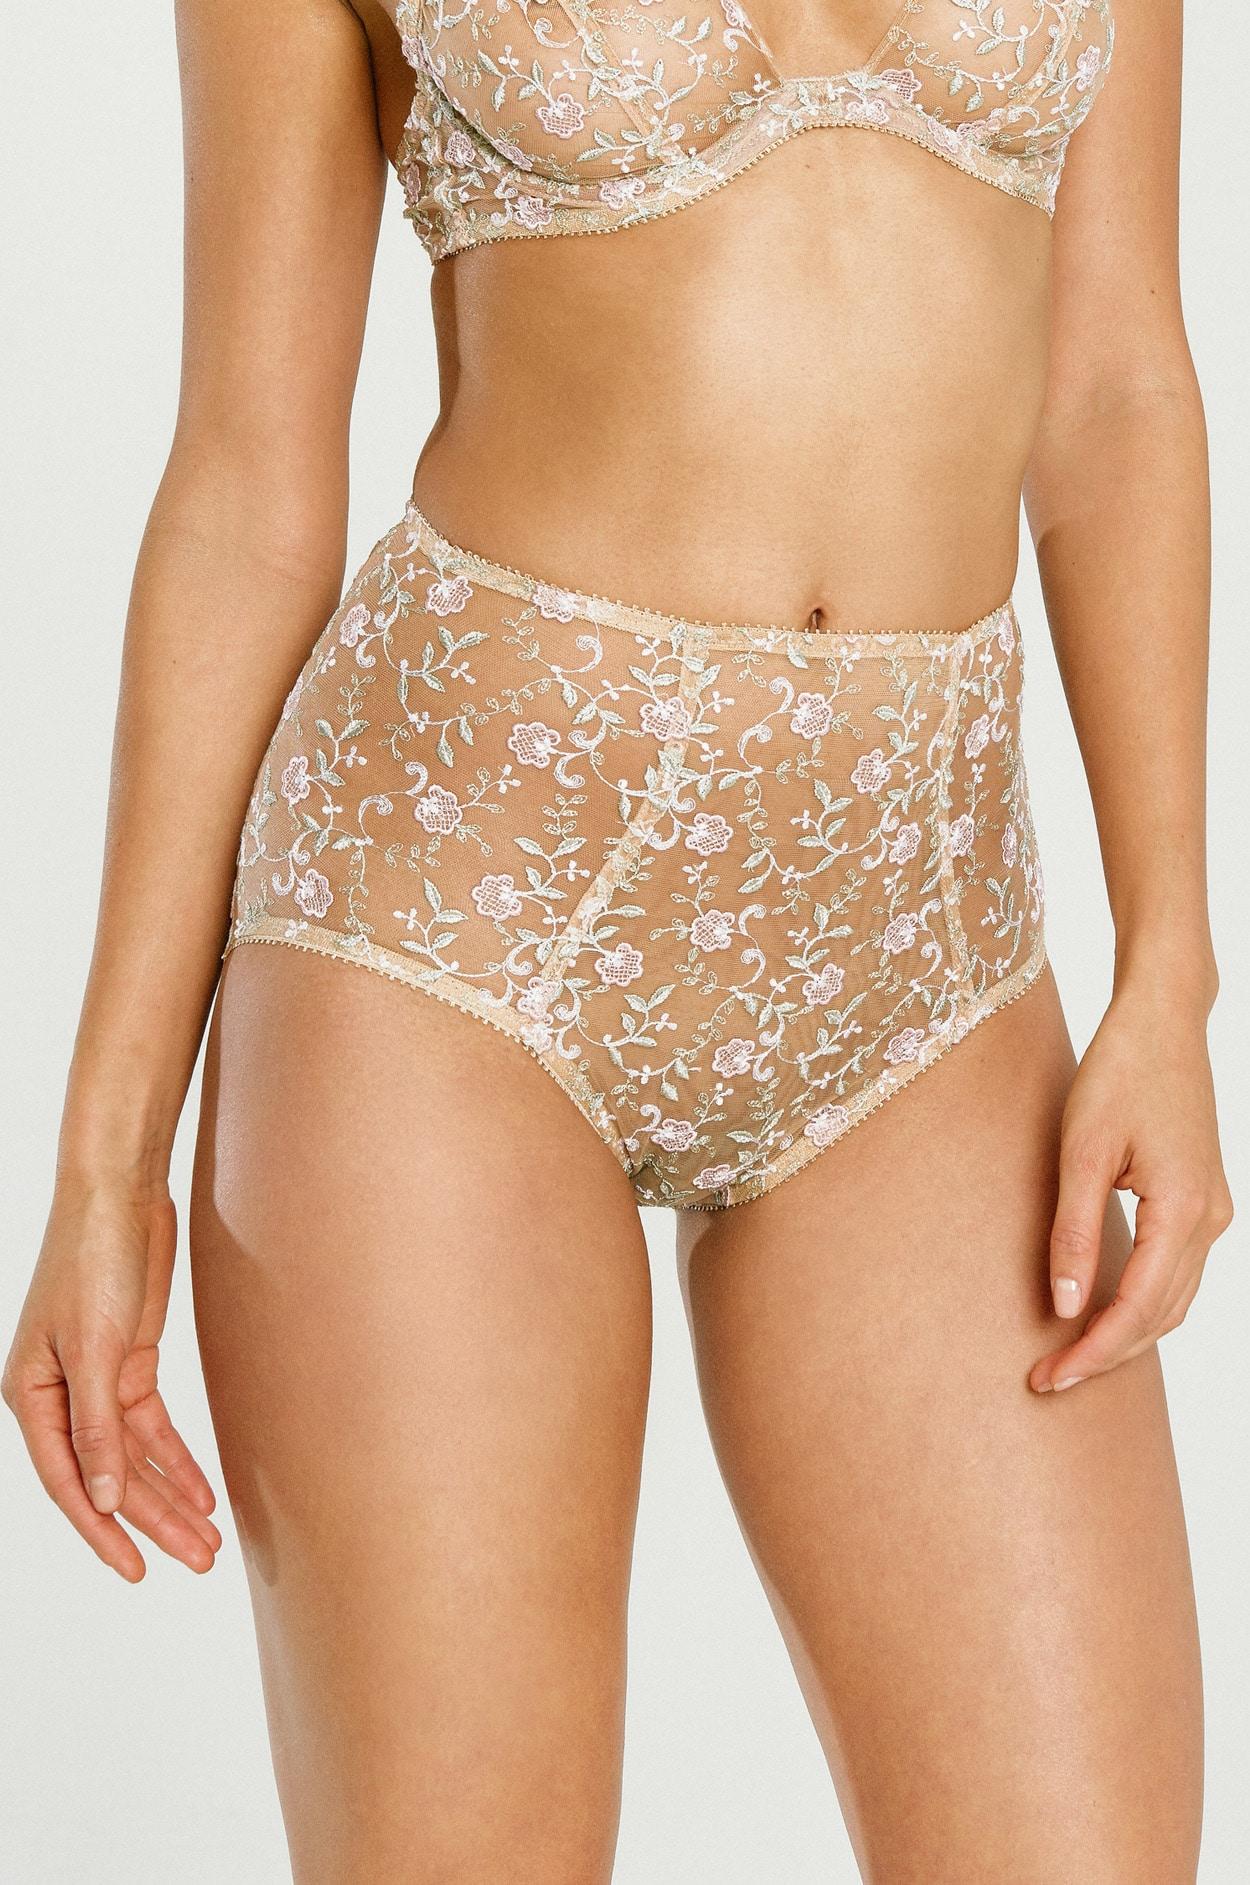 e0e4830fdf8 High Waisted Lace Panty, High Waist Underwear, Highwaisted Bottom